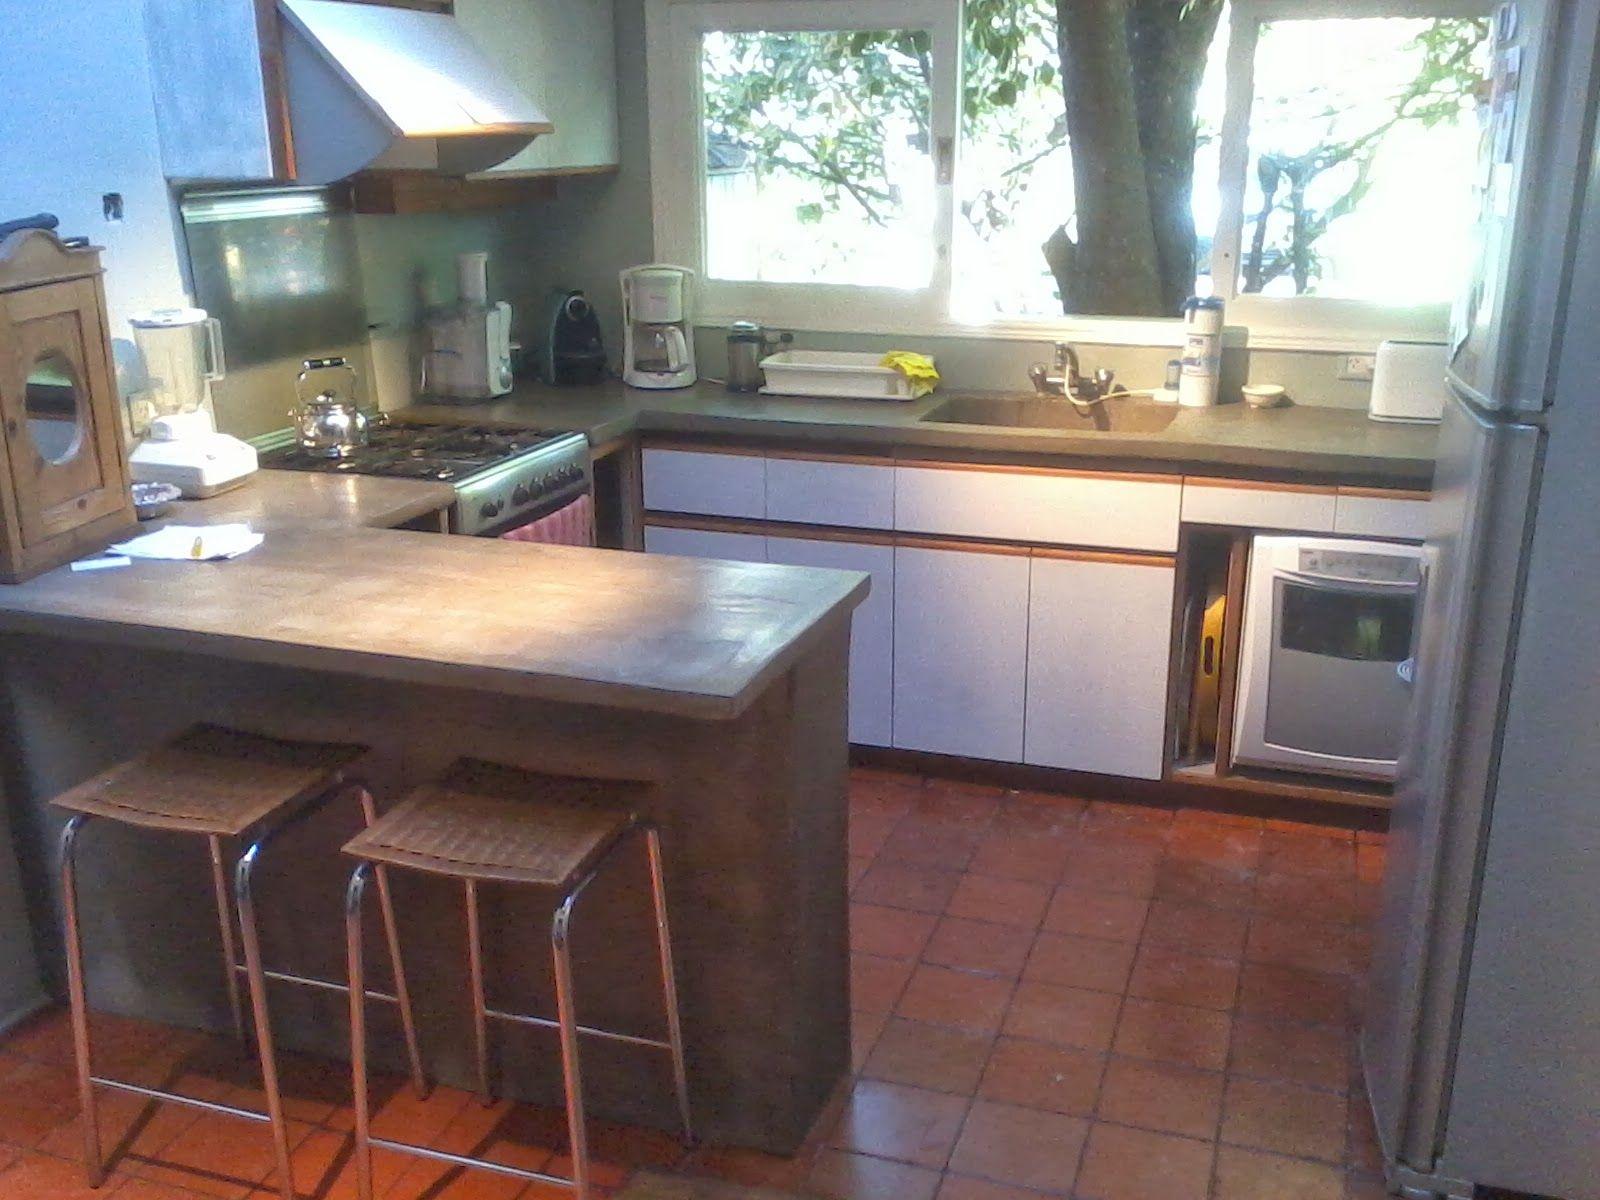 muebles de cocina barra mesada cemento 1600